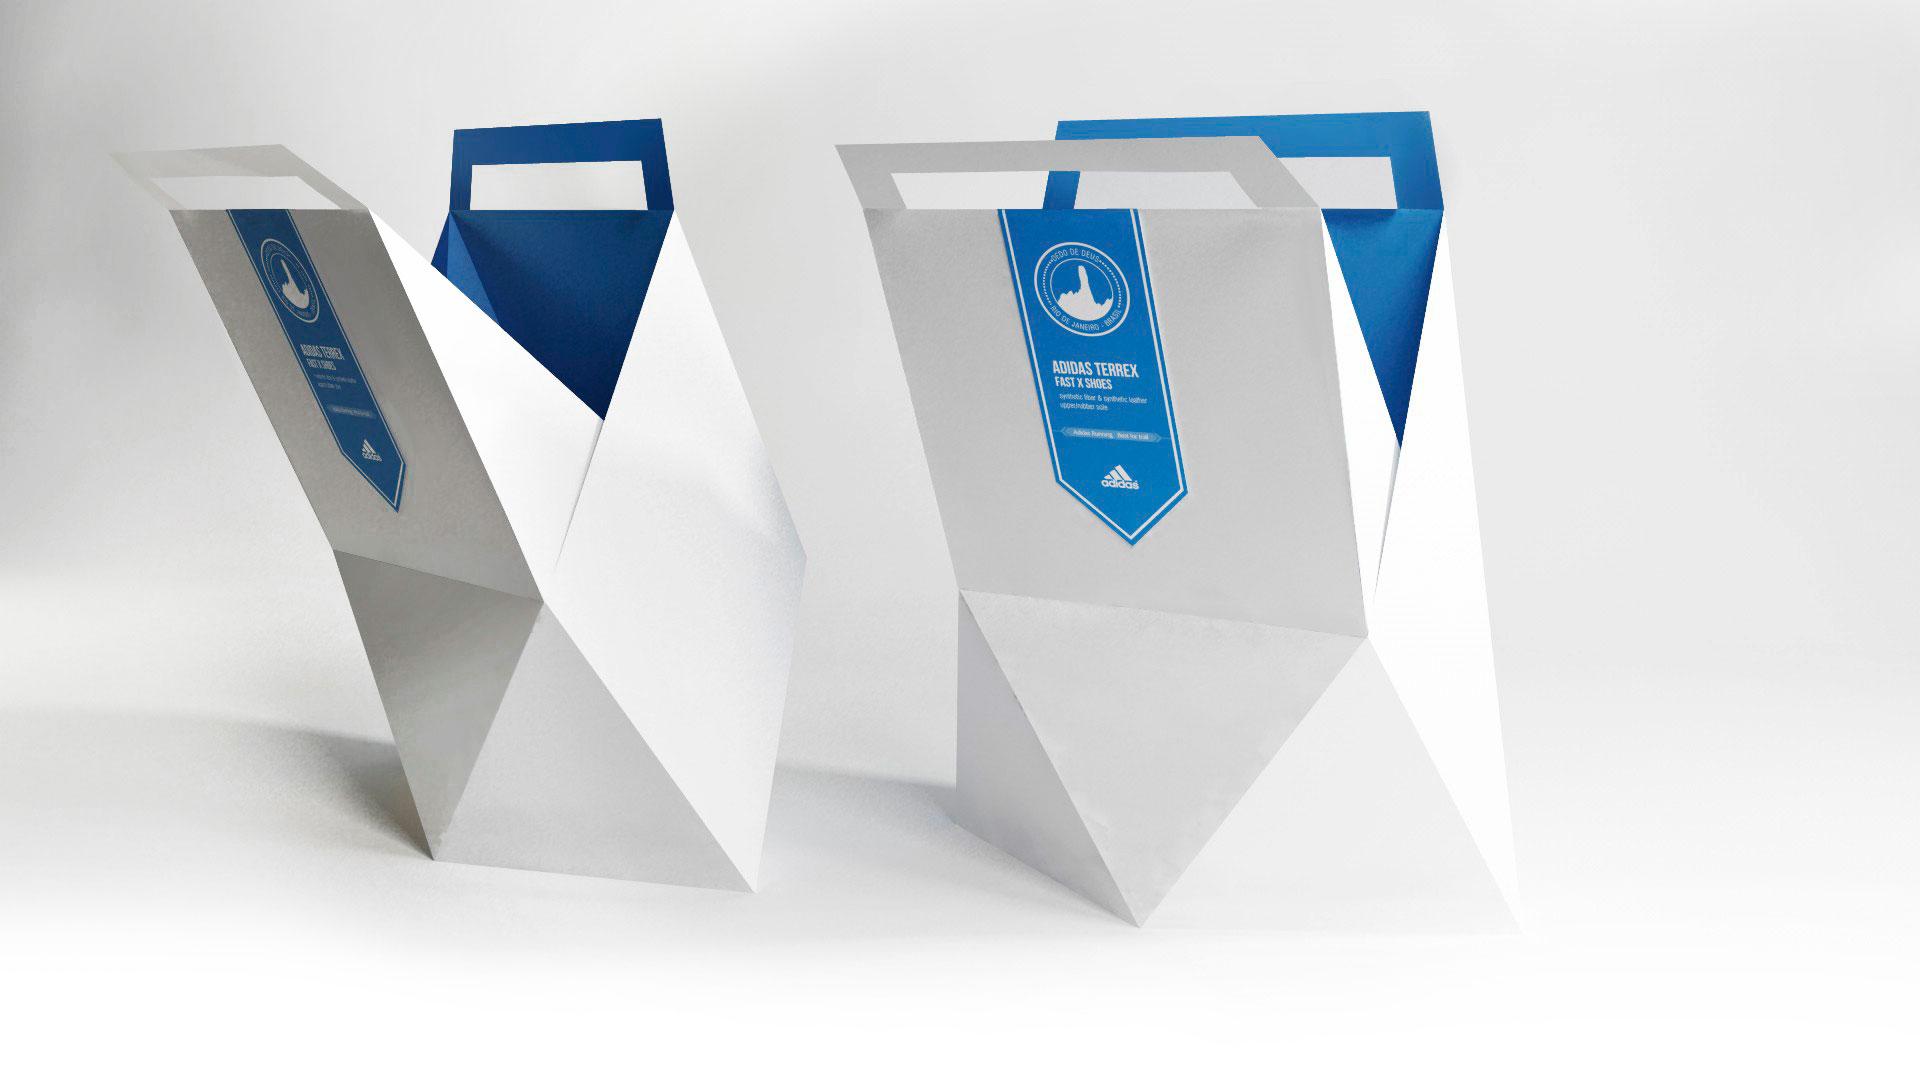 Shoe Fast Adidas X PackagingAlinearide Terrex LUMSzpGqV